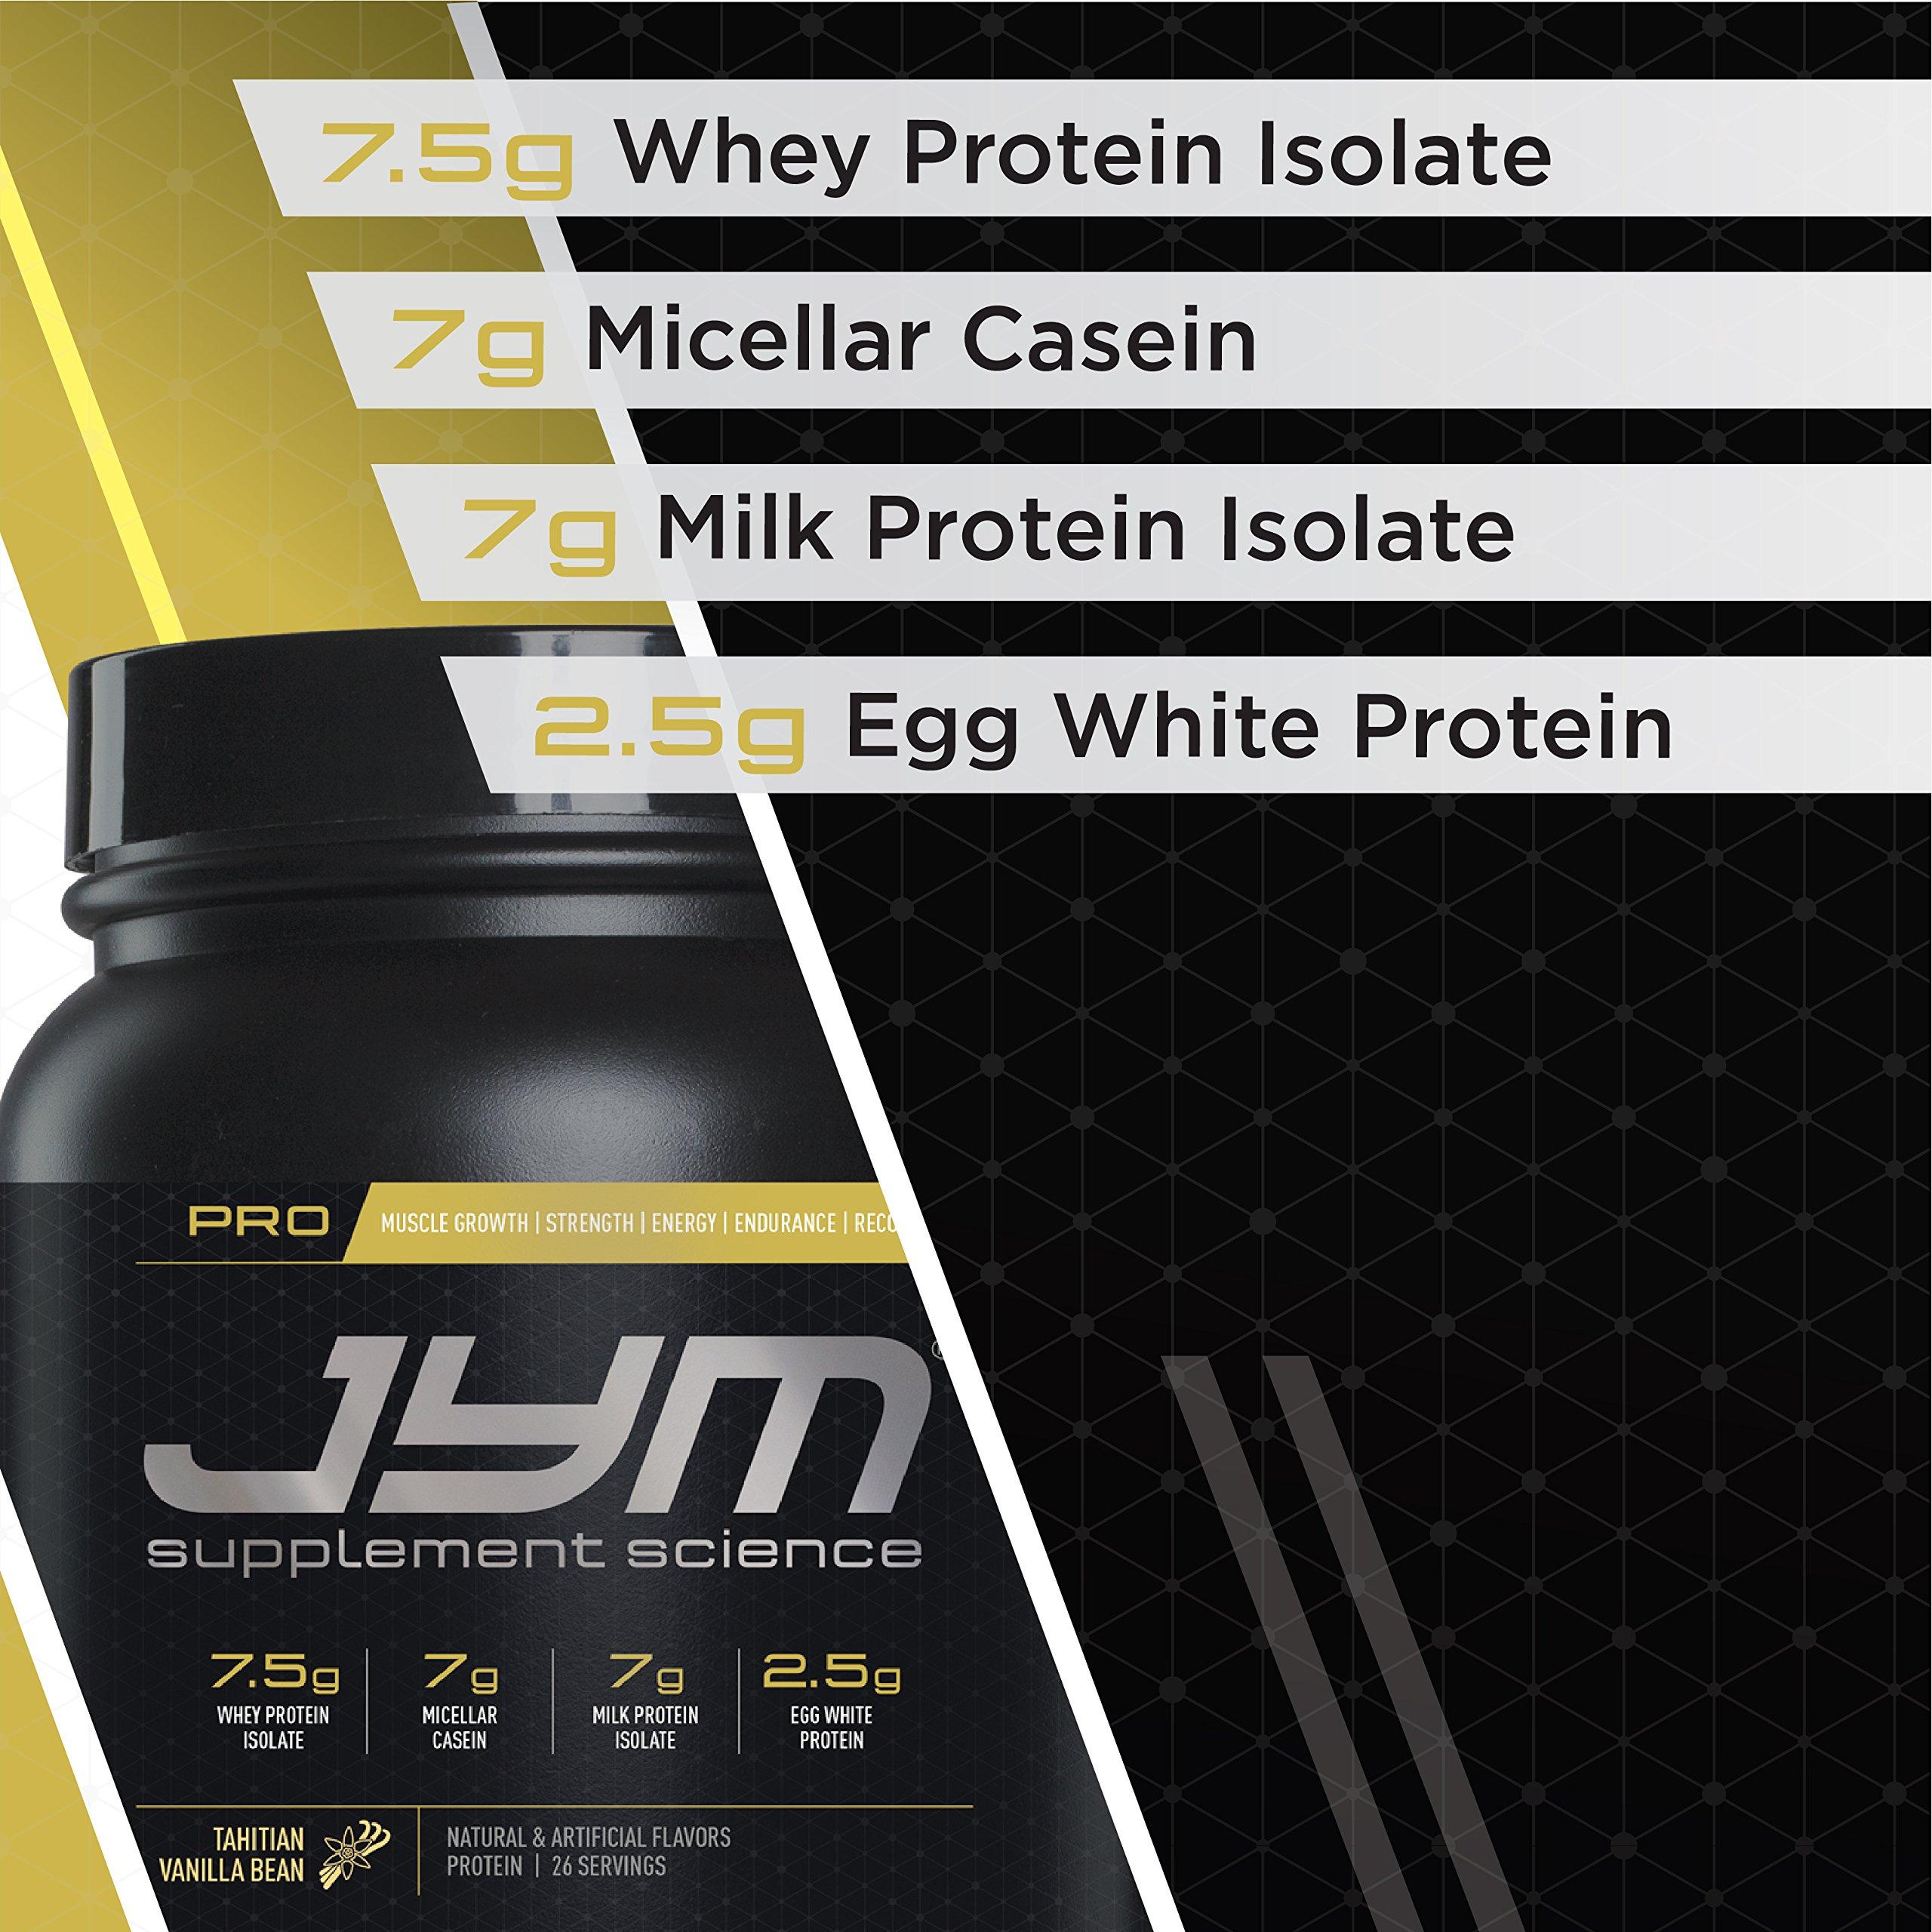 Pro Jym Protein Powder - Egg White, Milk, Whey protein isolates & Micellar Casein   JYM Supplement Science   Tahitian Vanilla Bean Flavor, 4 Lb by JYM Supplement Science (Image #4)